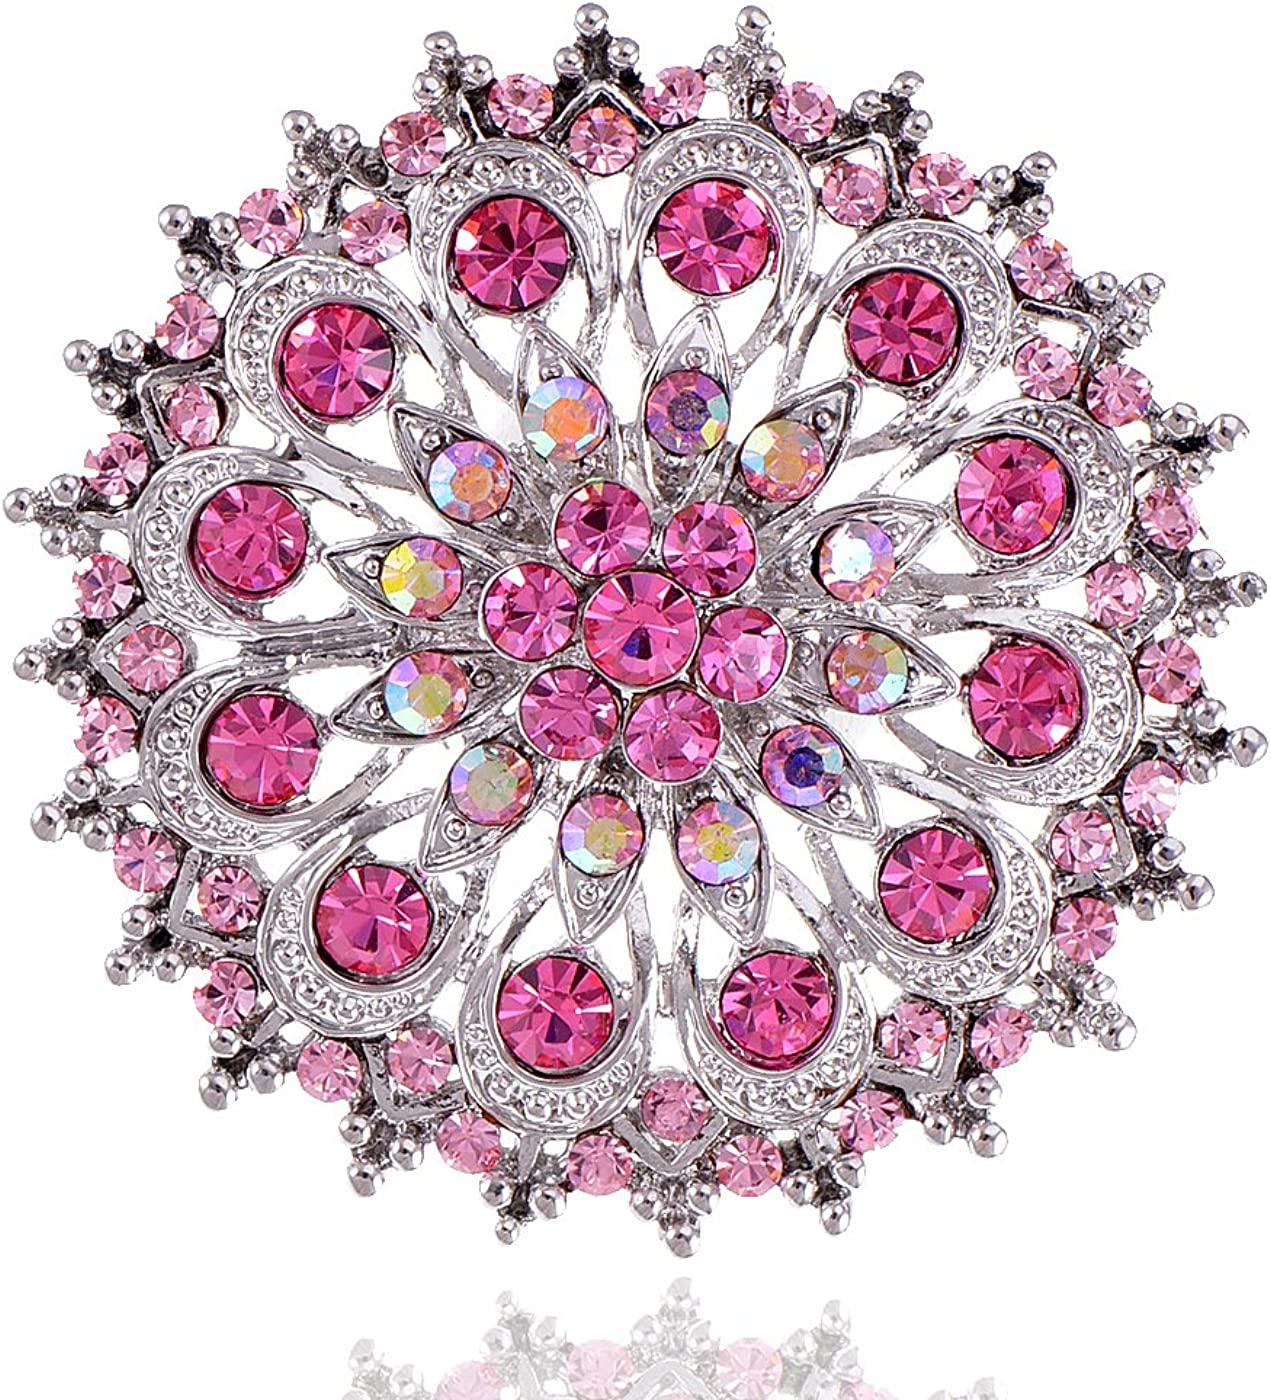 Alilang Adustable Silver Blue Purple Iridescent Crystal Rhinestones Snowflake Flower Floral Ring